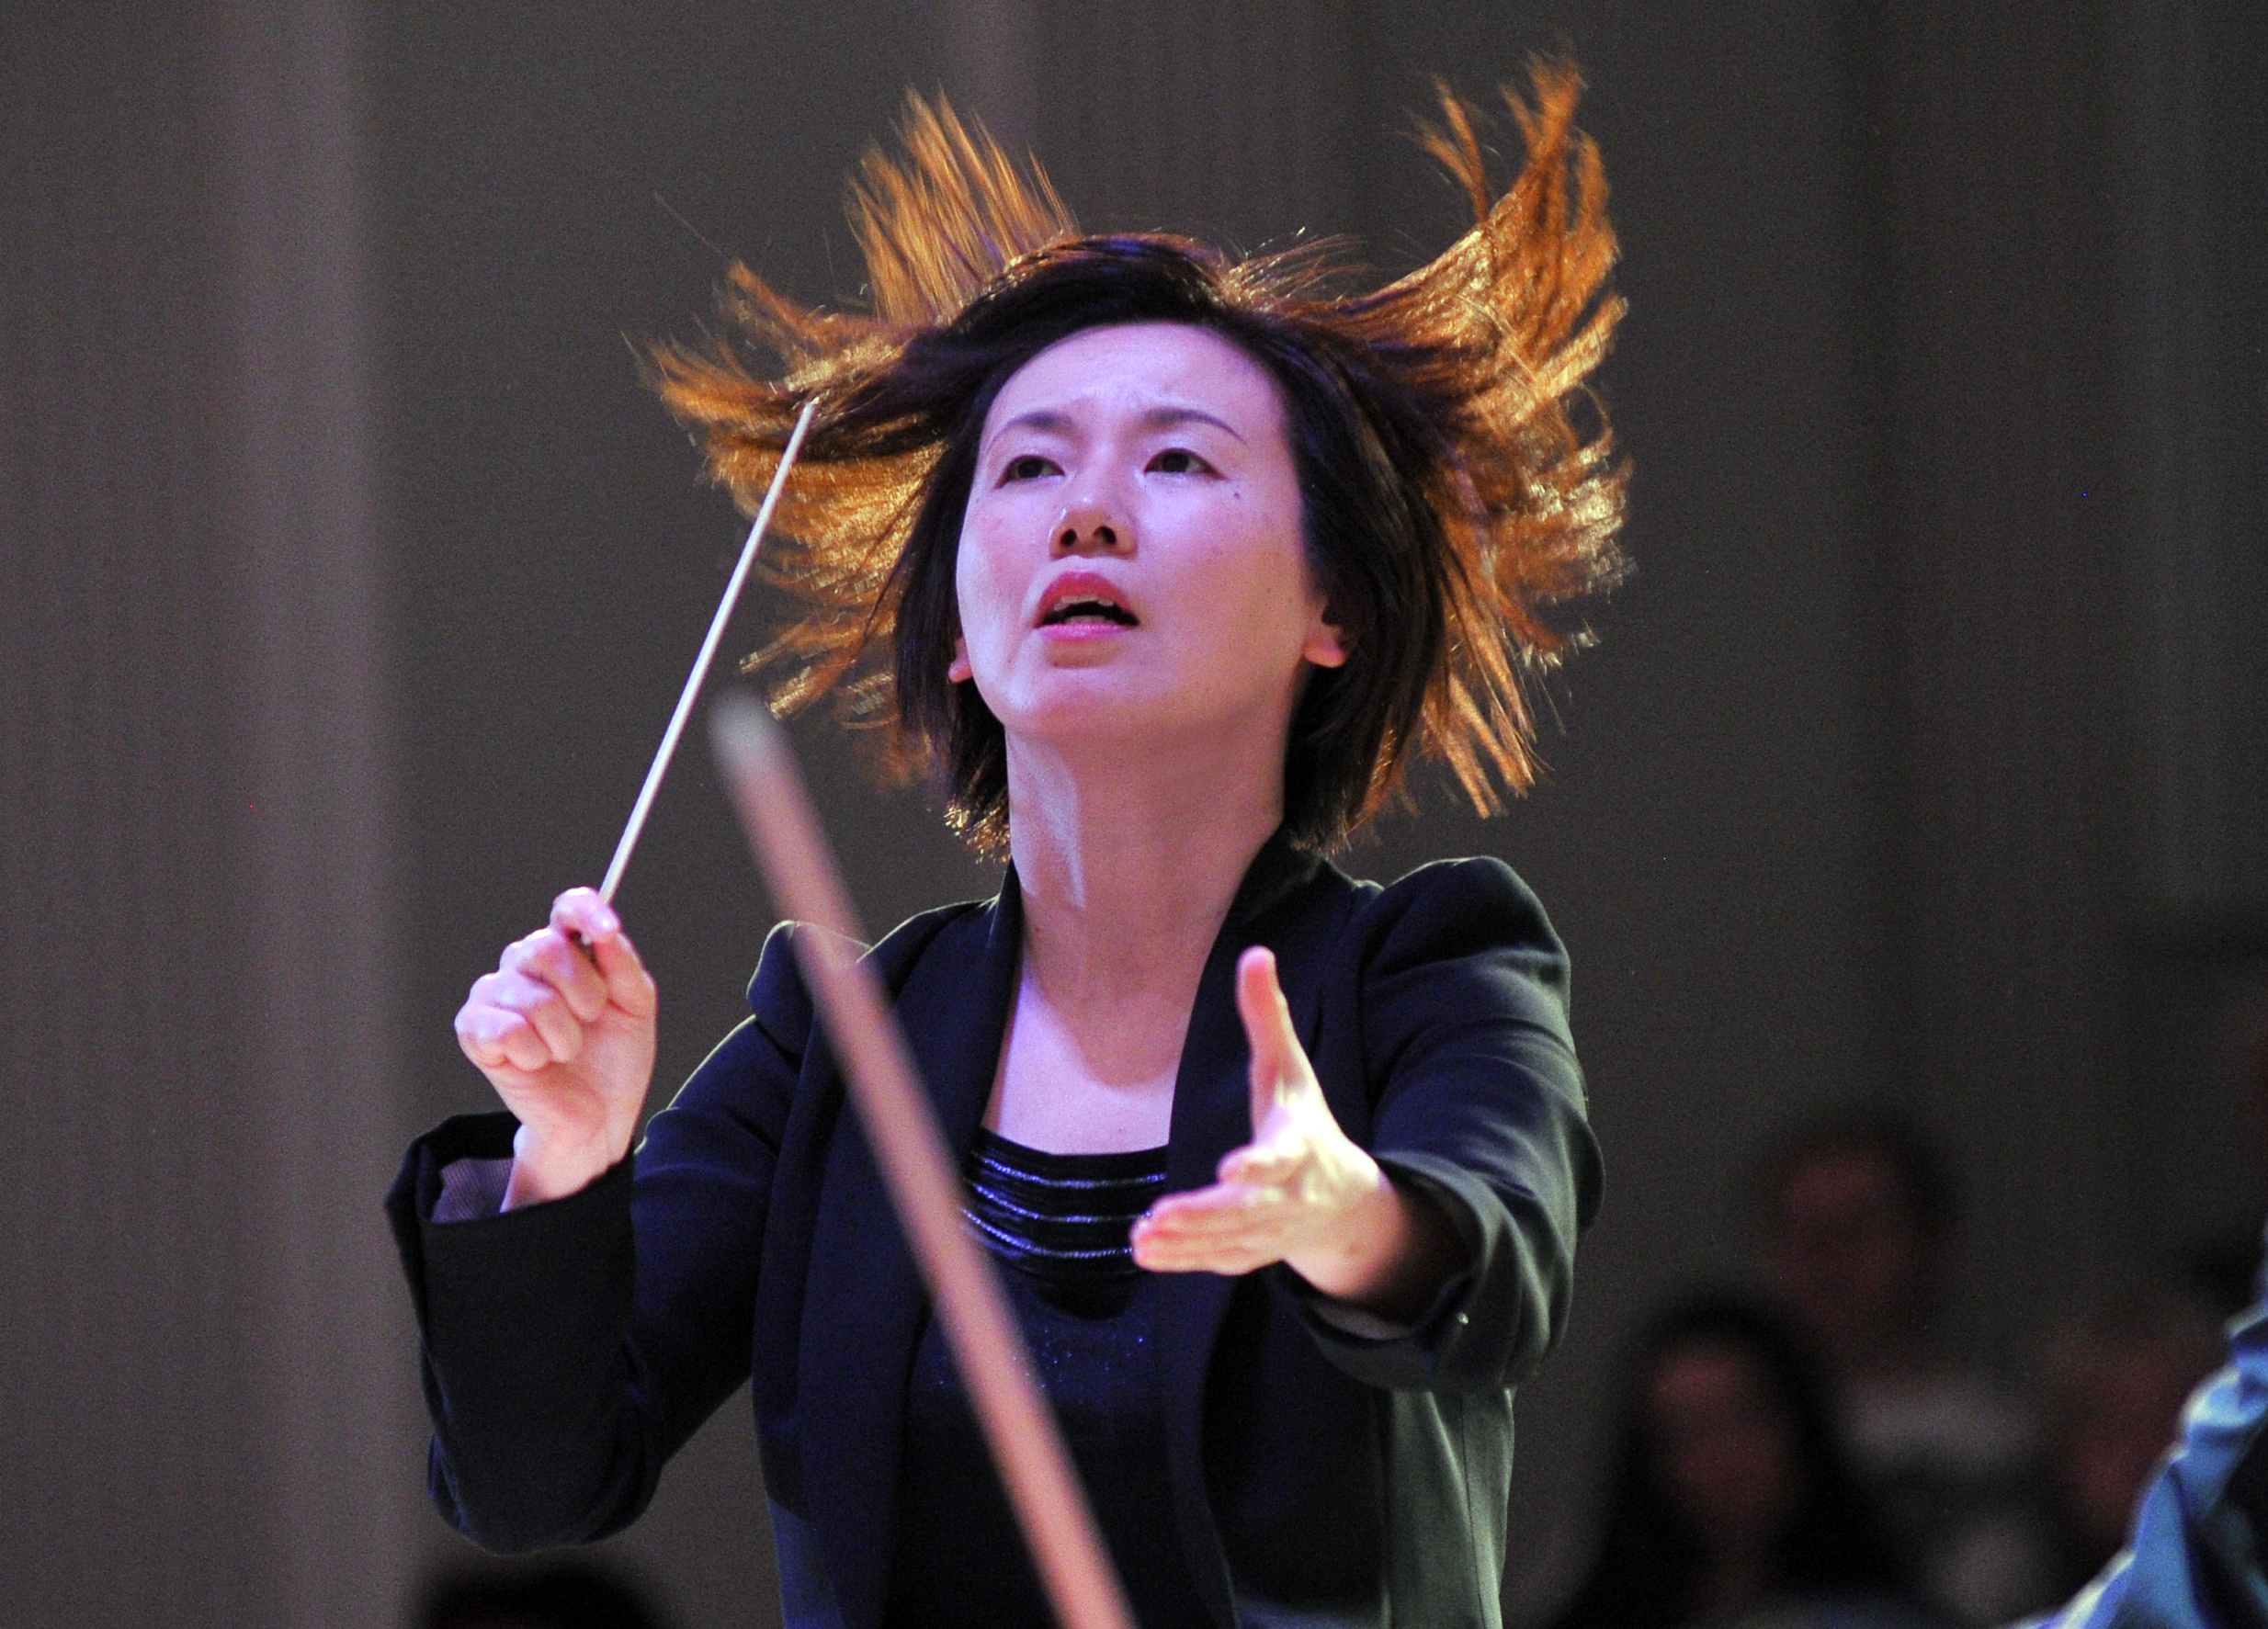 Бетховен и Брамс в преддверии Нового года